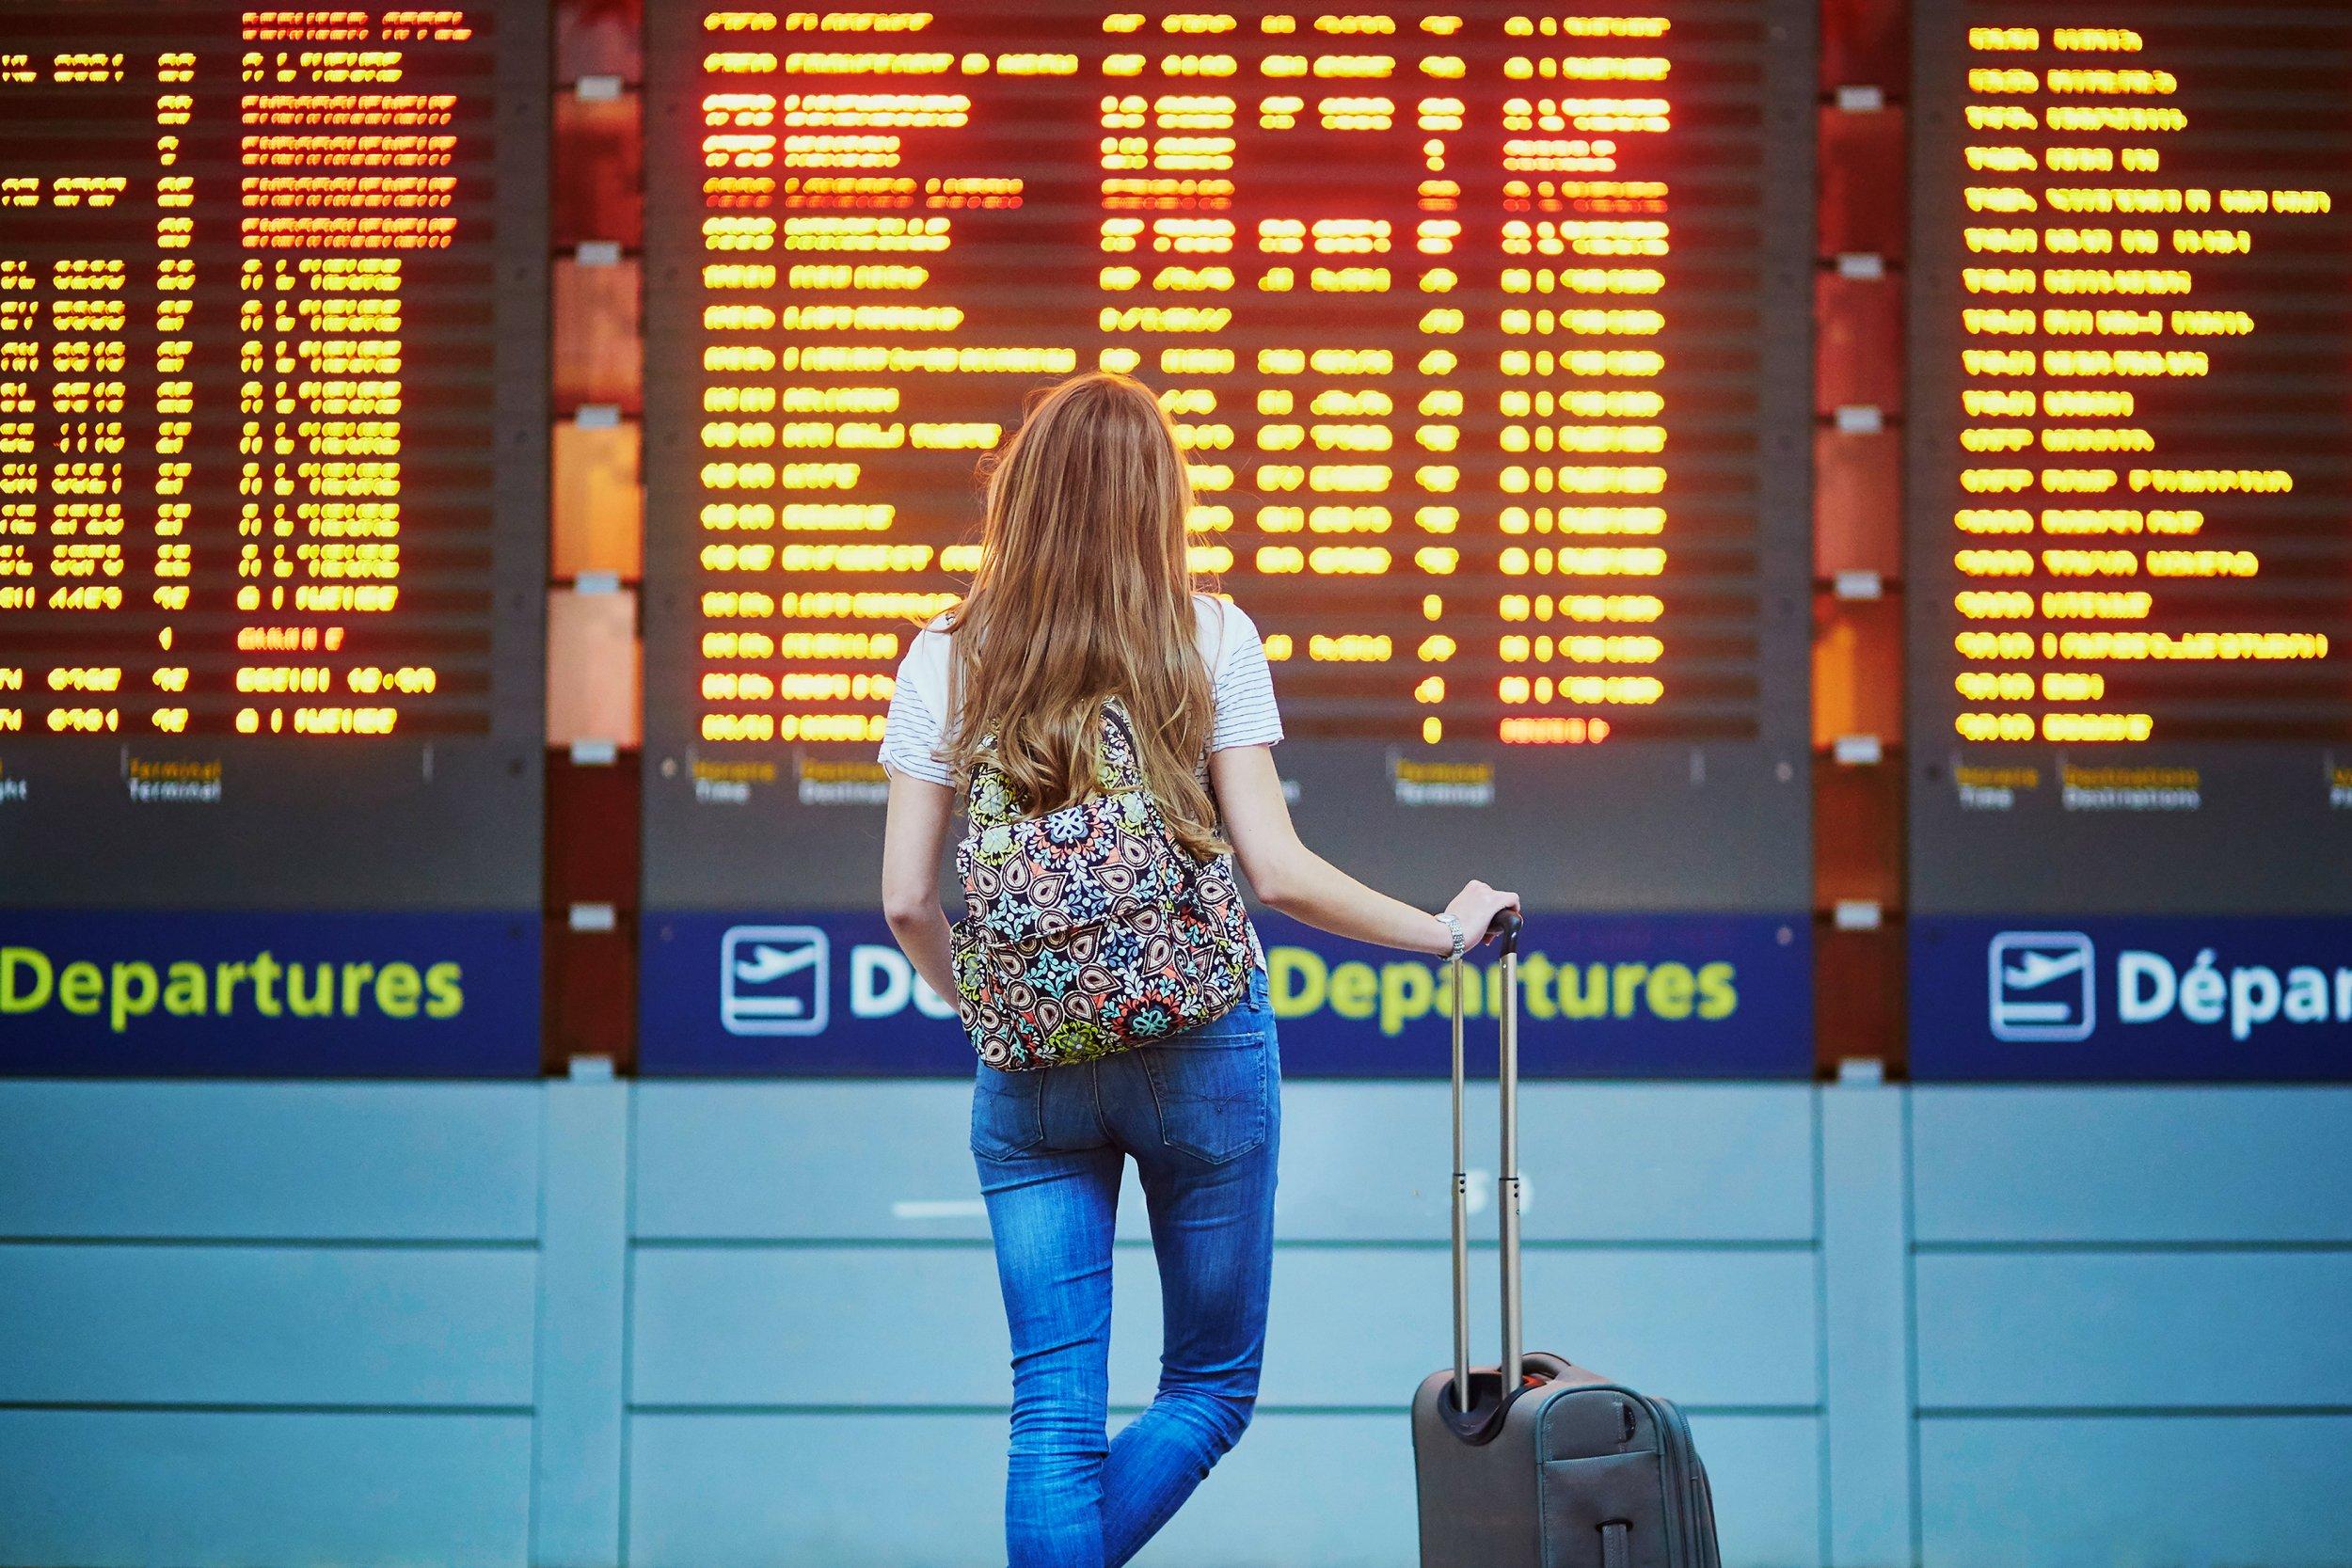 airport delay stock